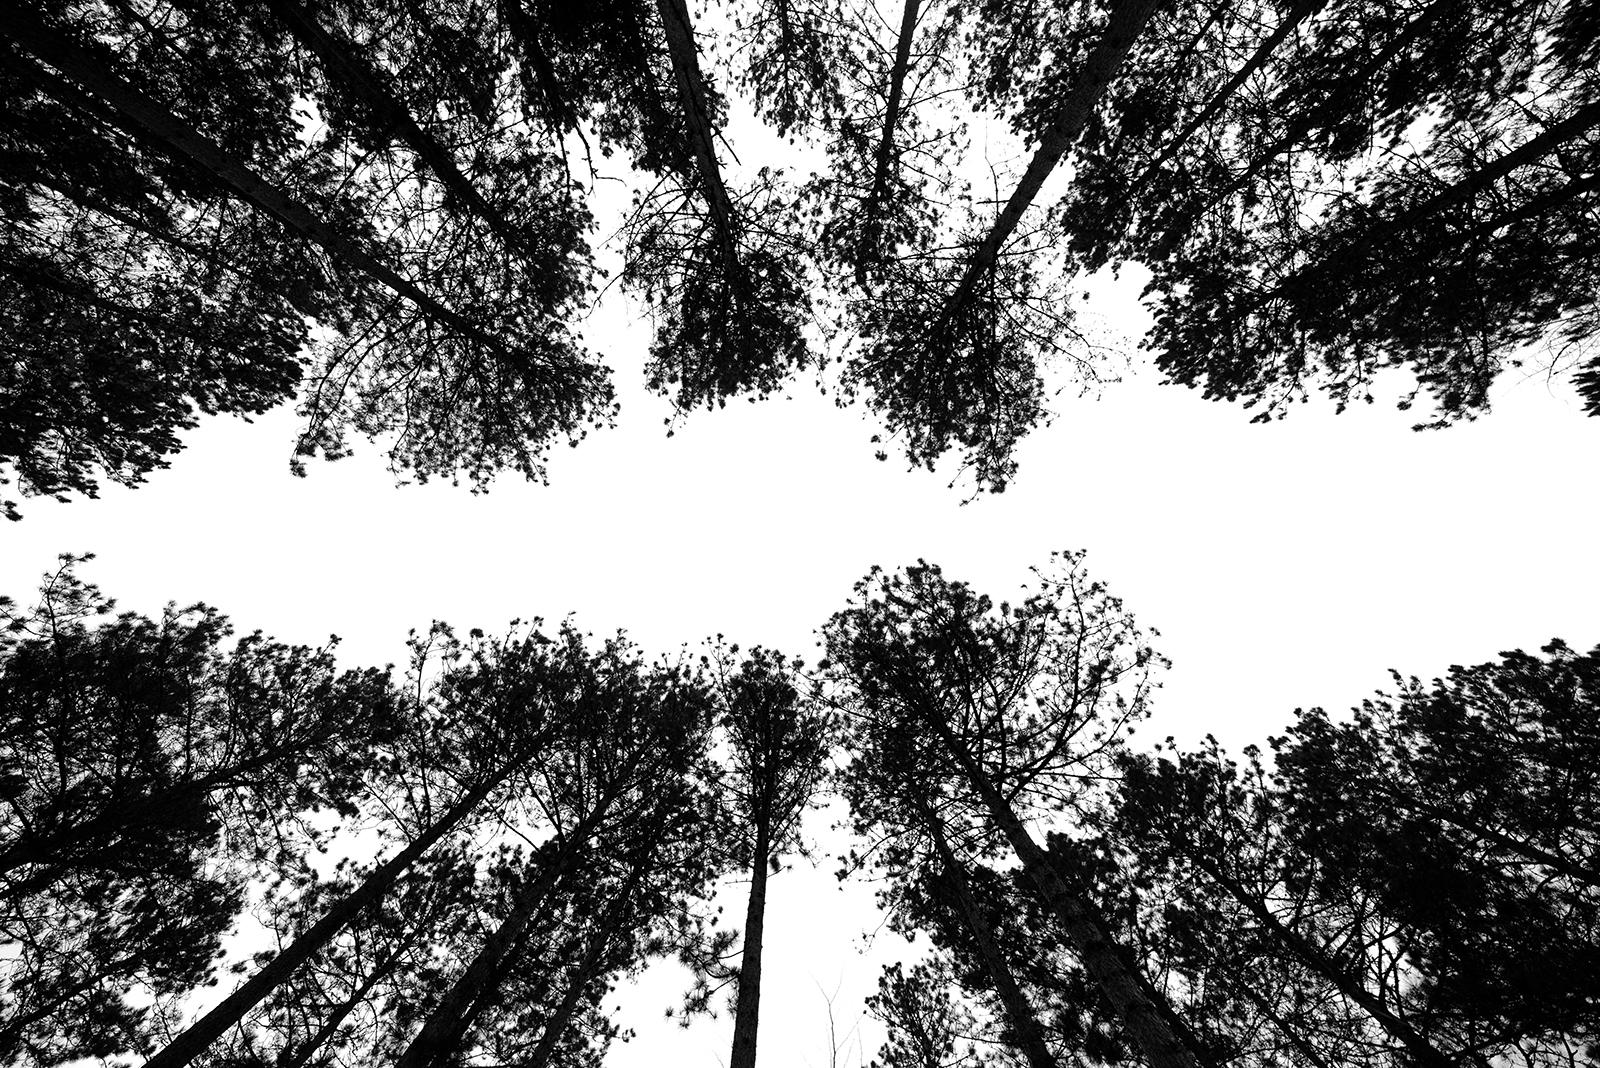 Trees in Upper Peninsula